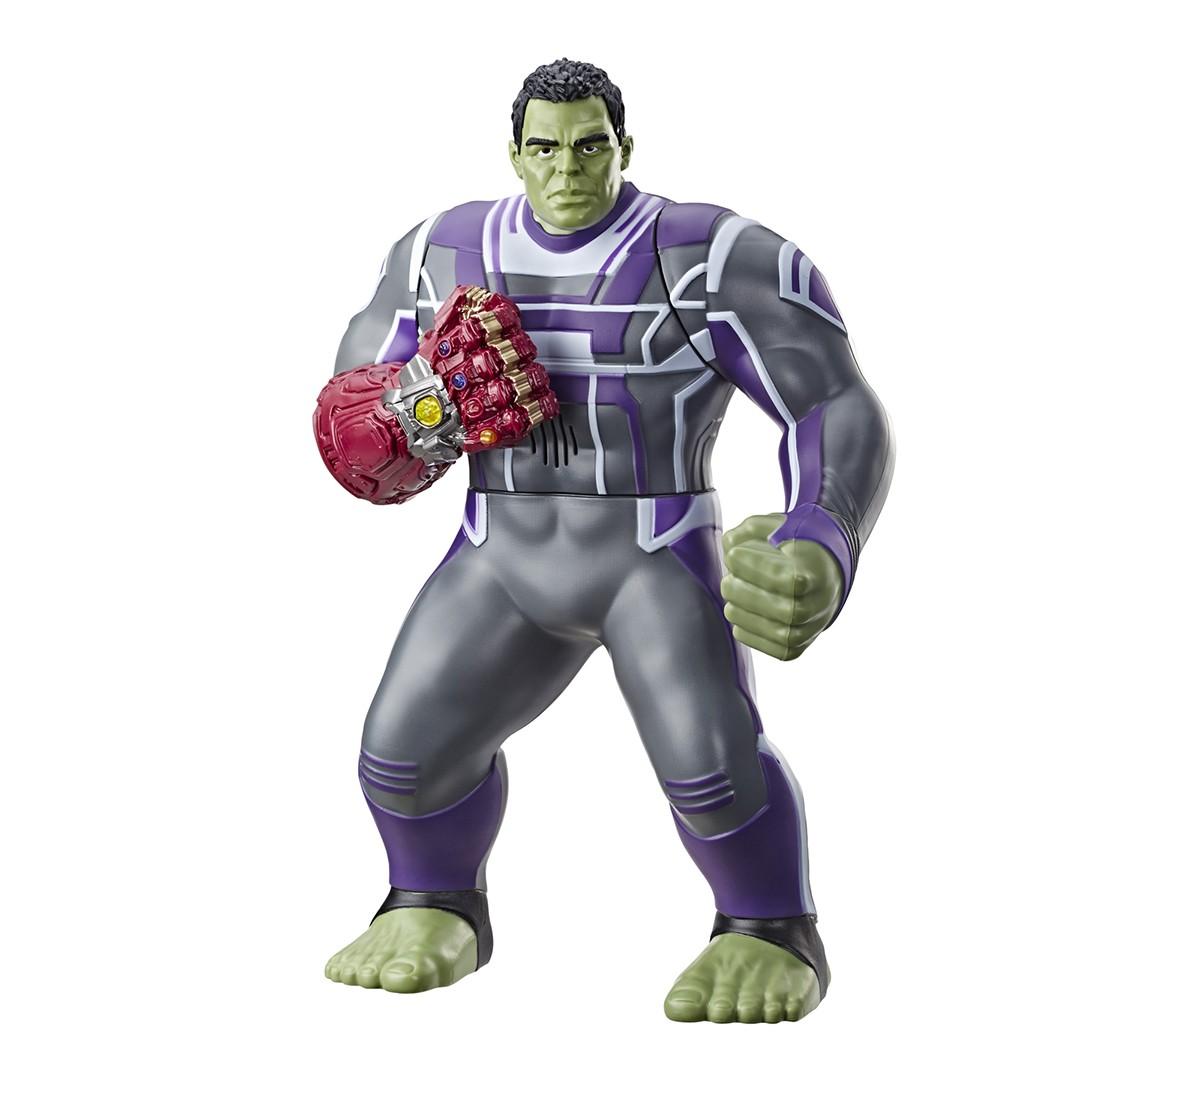 Marvel Avengers: Endgame Power Punch Hulk 13.75-Inch Action Figures for Kids age 4Y+